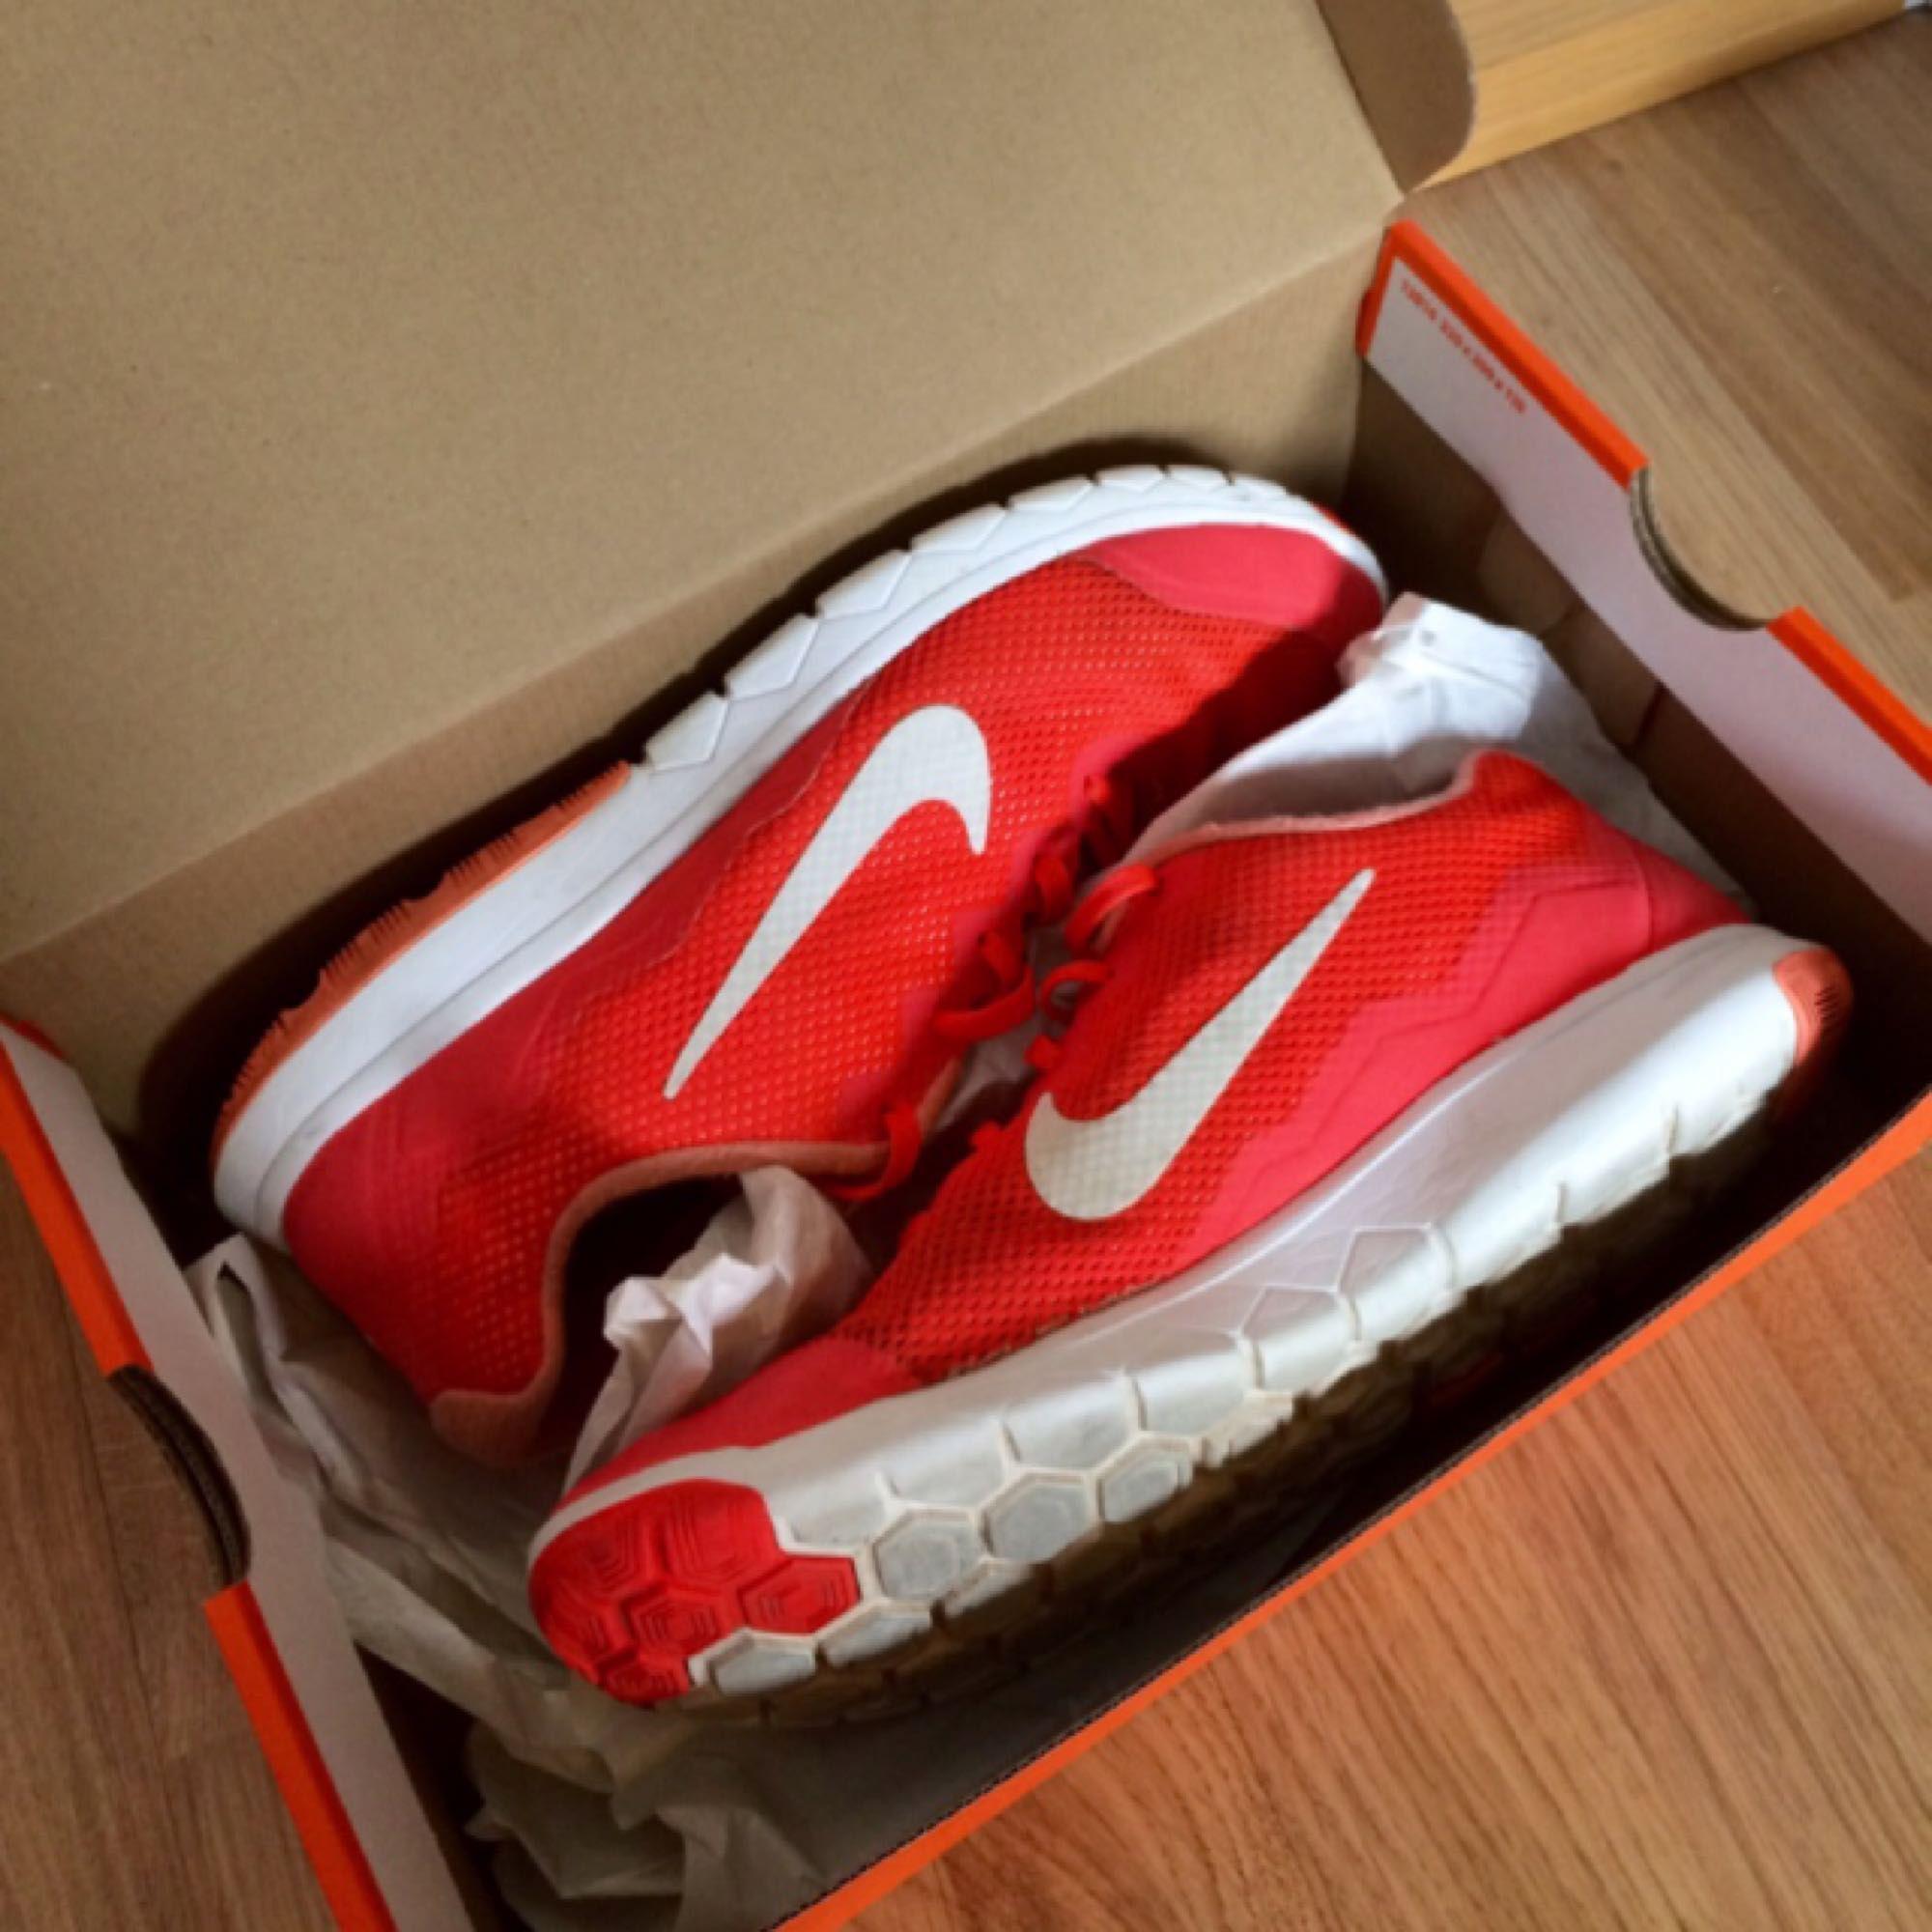 sale retailer 342ea 20cfd official photos 00ee4 4bacf Korallrosa Nike idrottsskor i bra skick. Aldrig  använda!